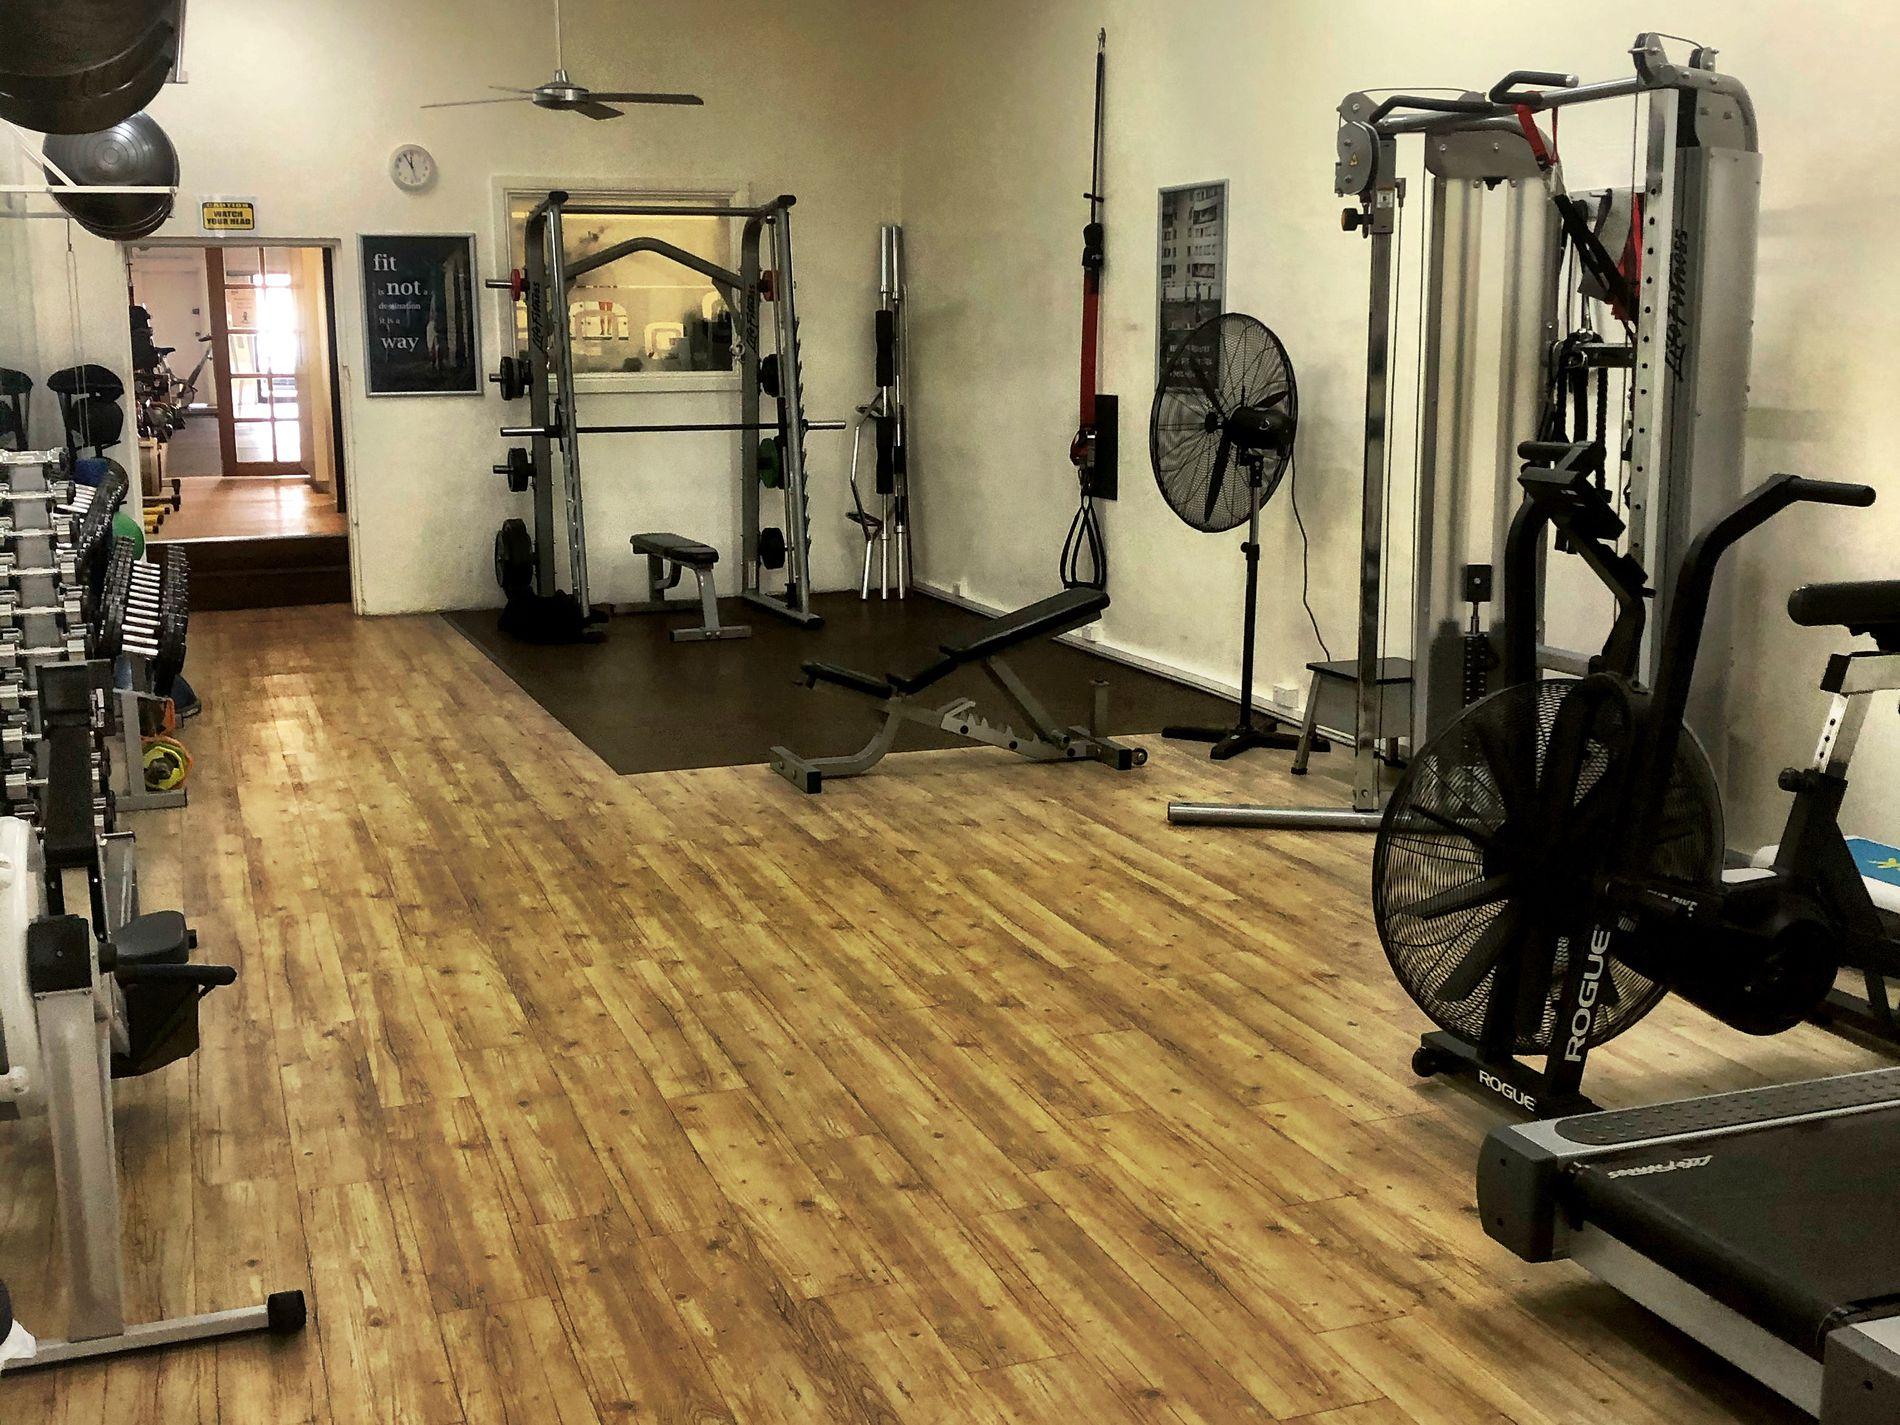 Bayside Gym Training Fitness Studio Business For Sale